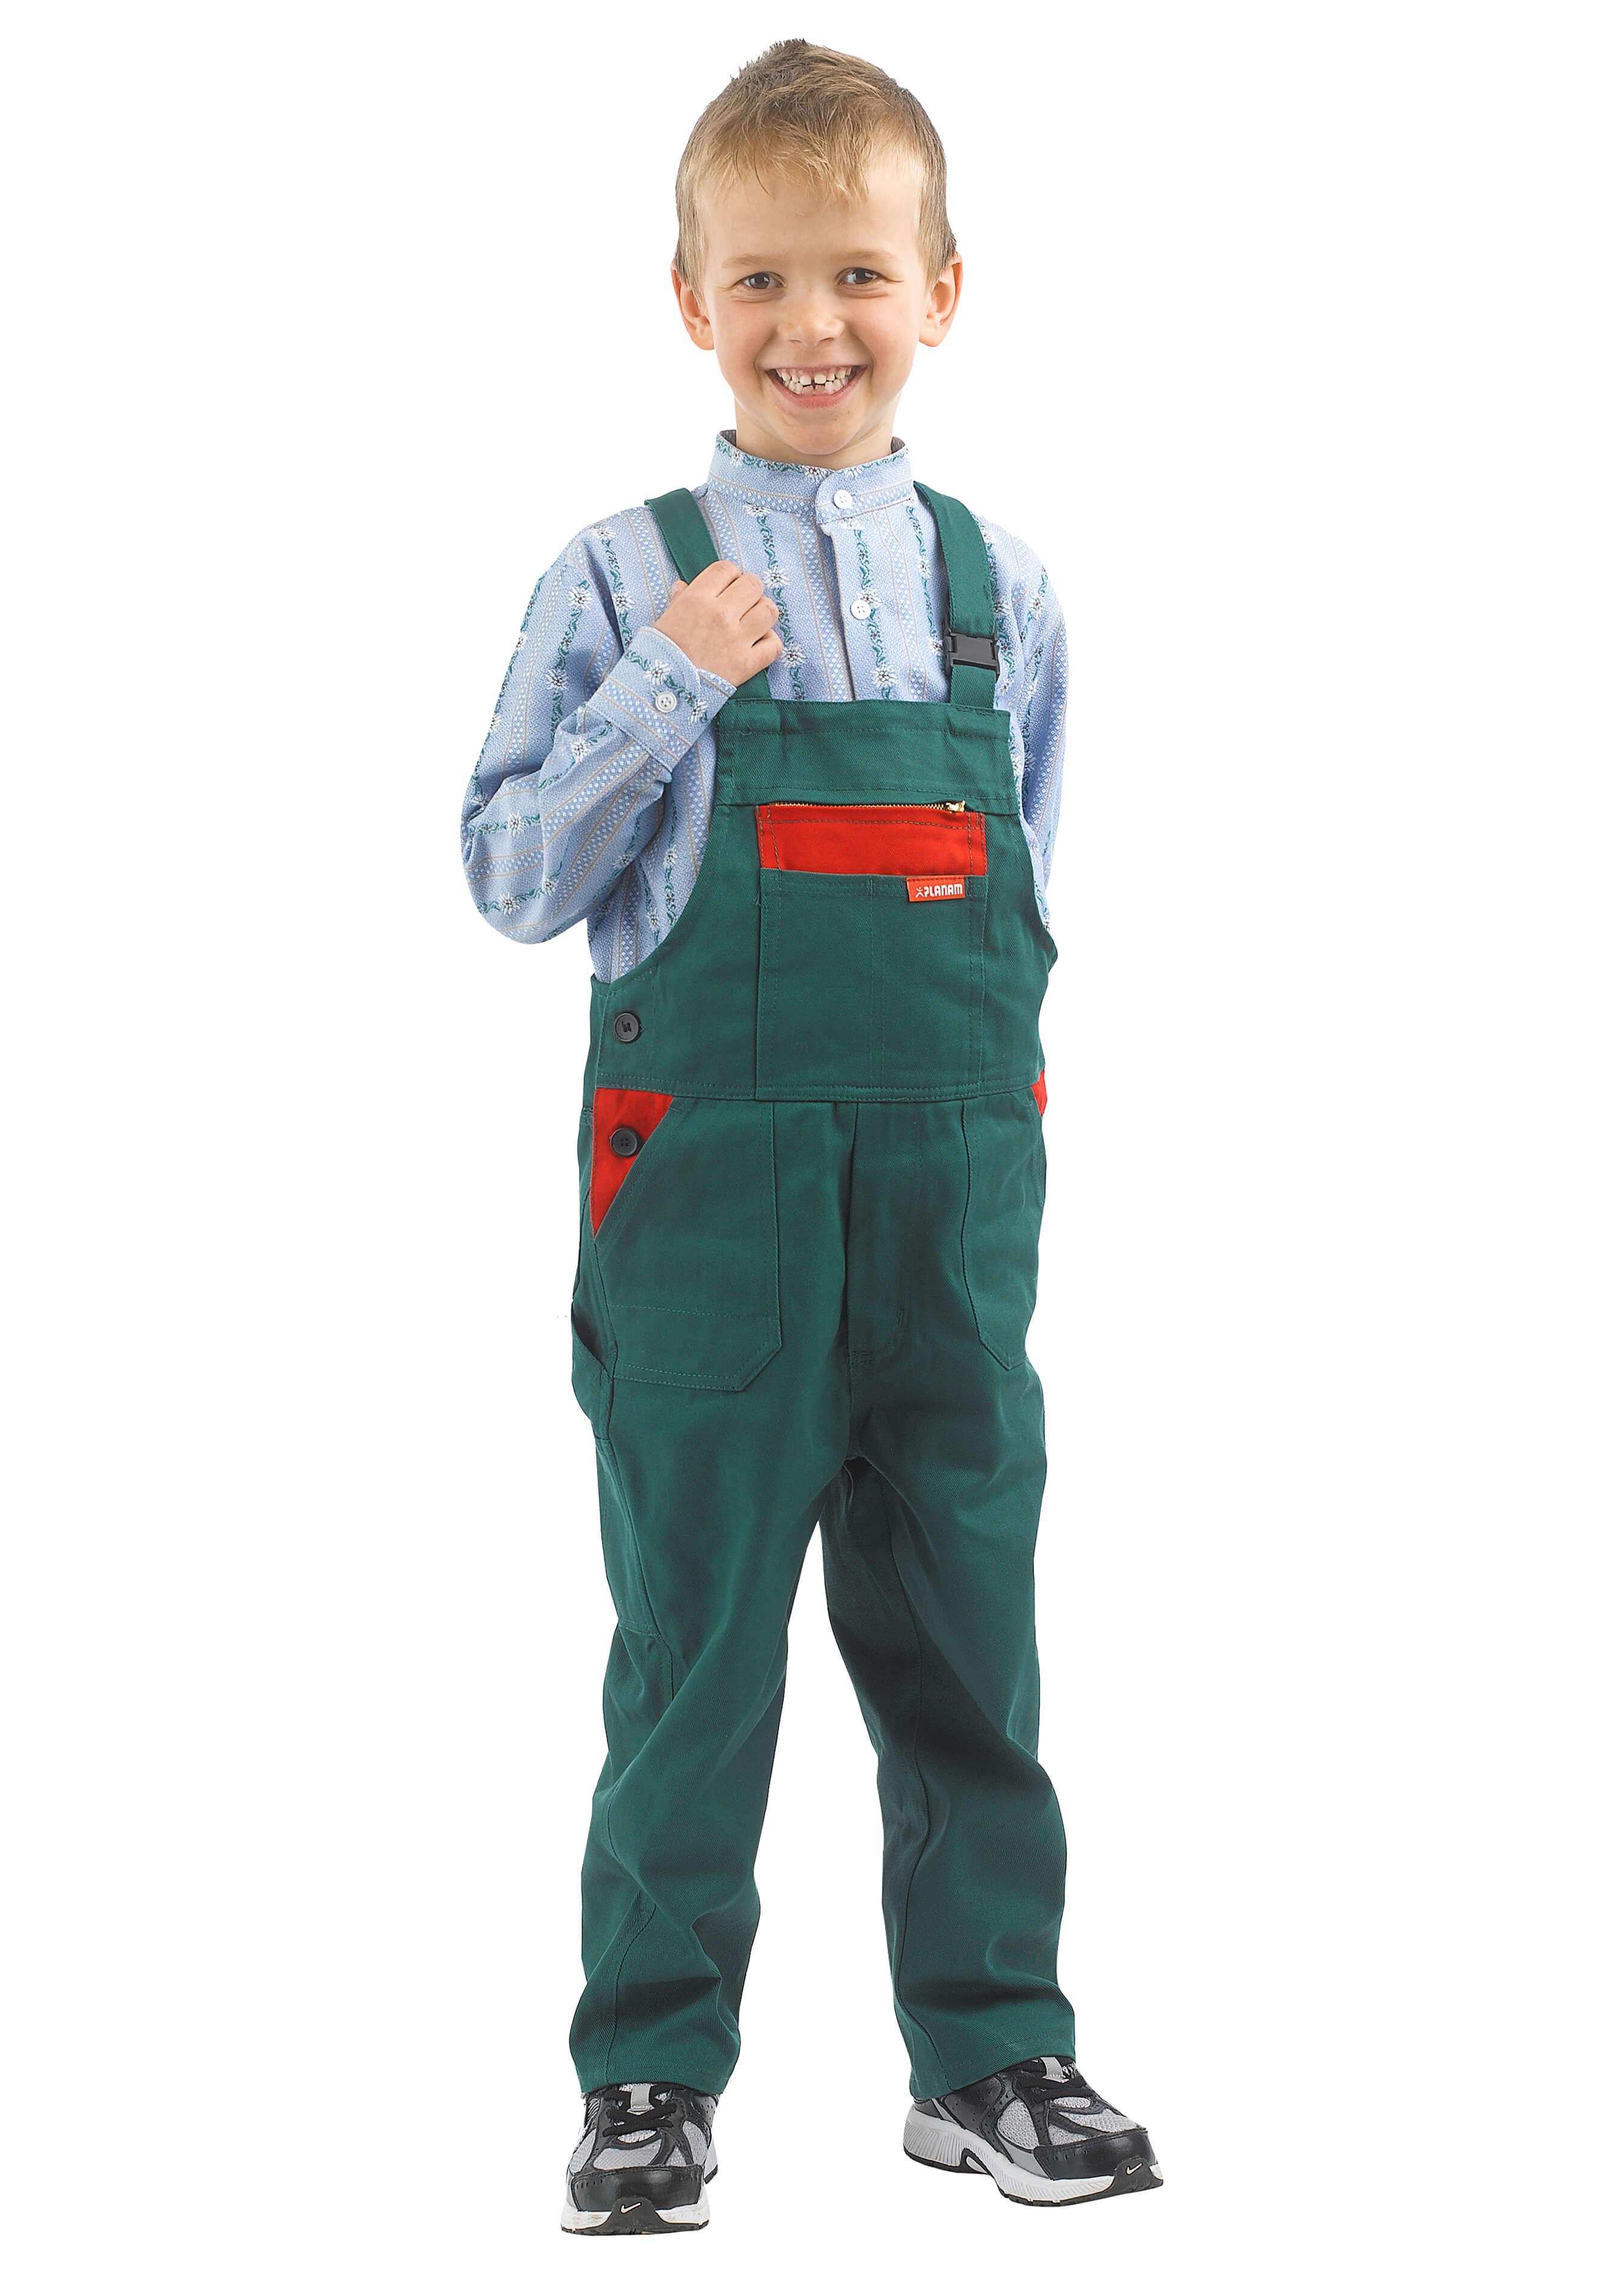 Planam strapazierfähige Kinder Arbeitslatzhose 276023110 1